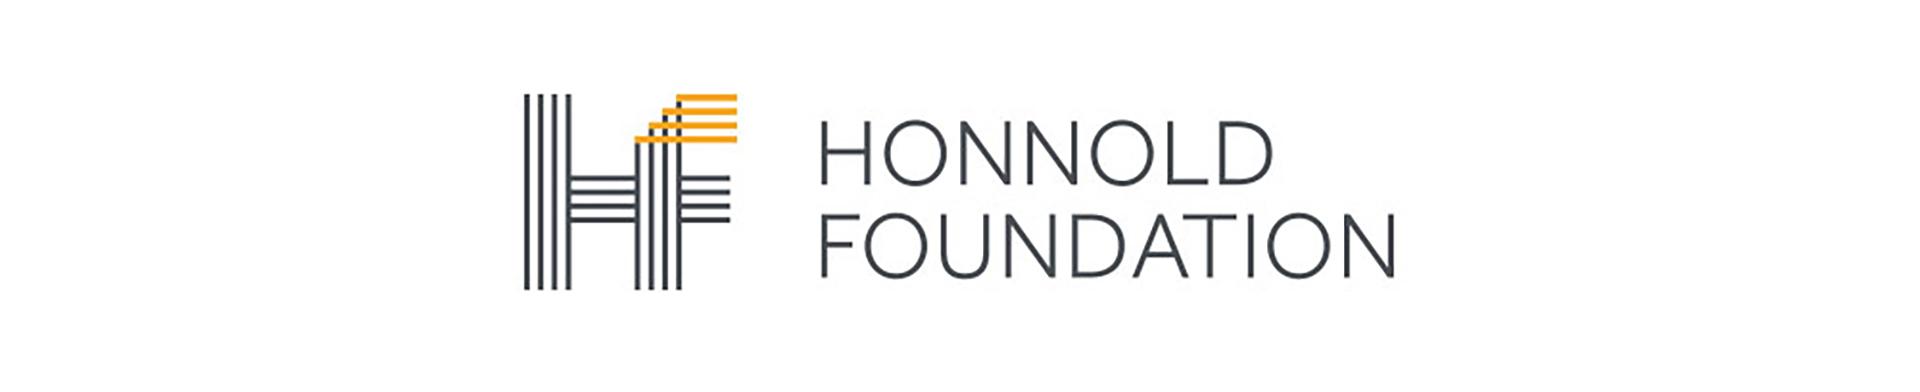 Honnold Foundation